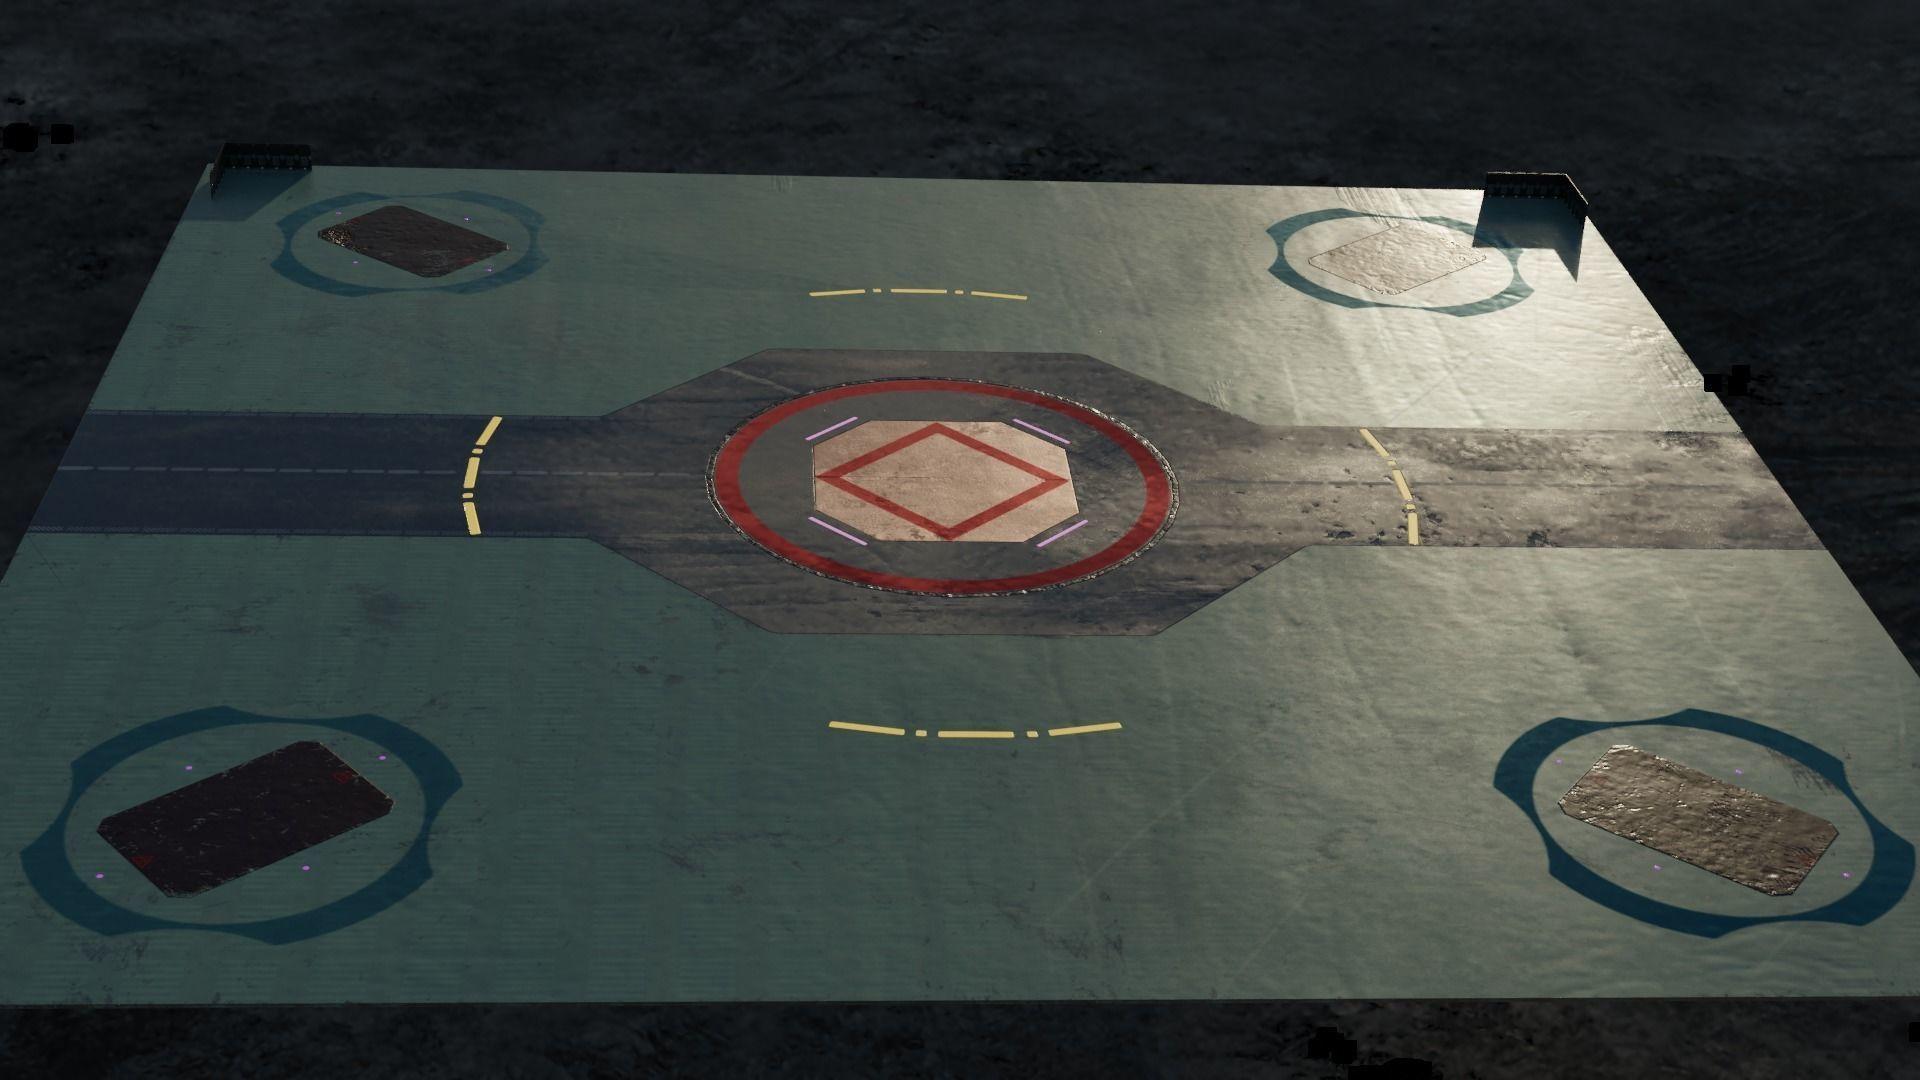 Futuristic Landing Pad